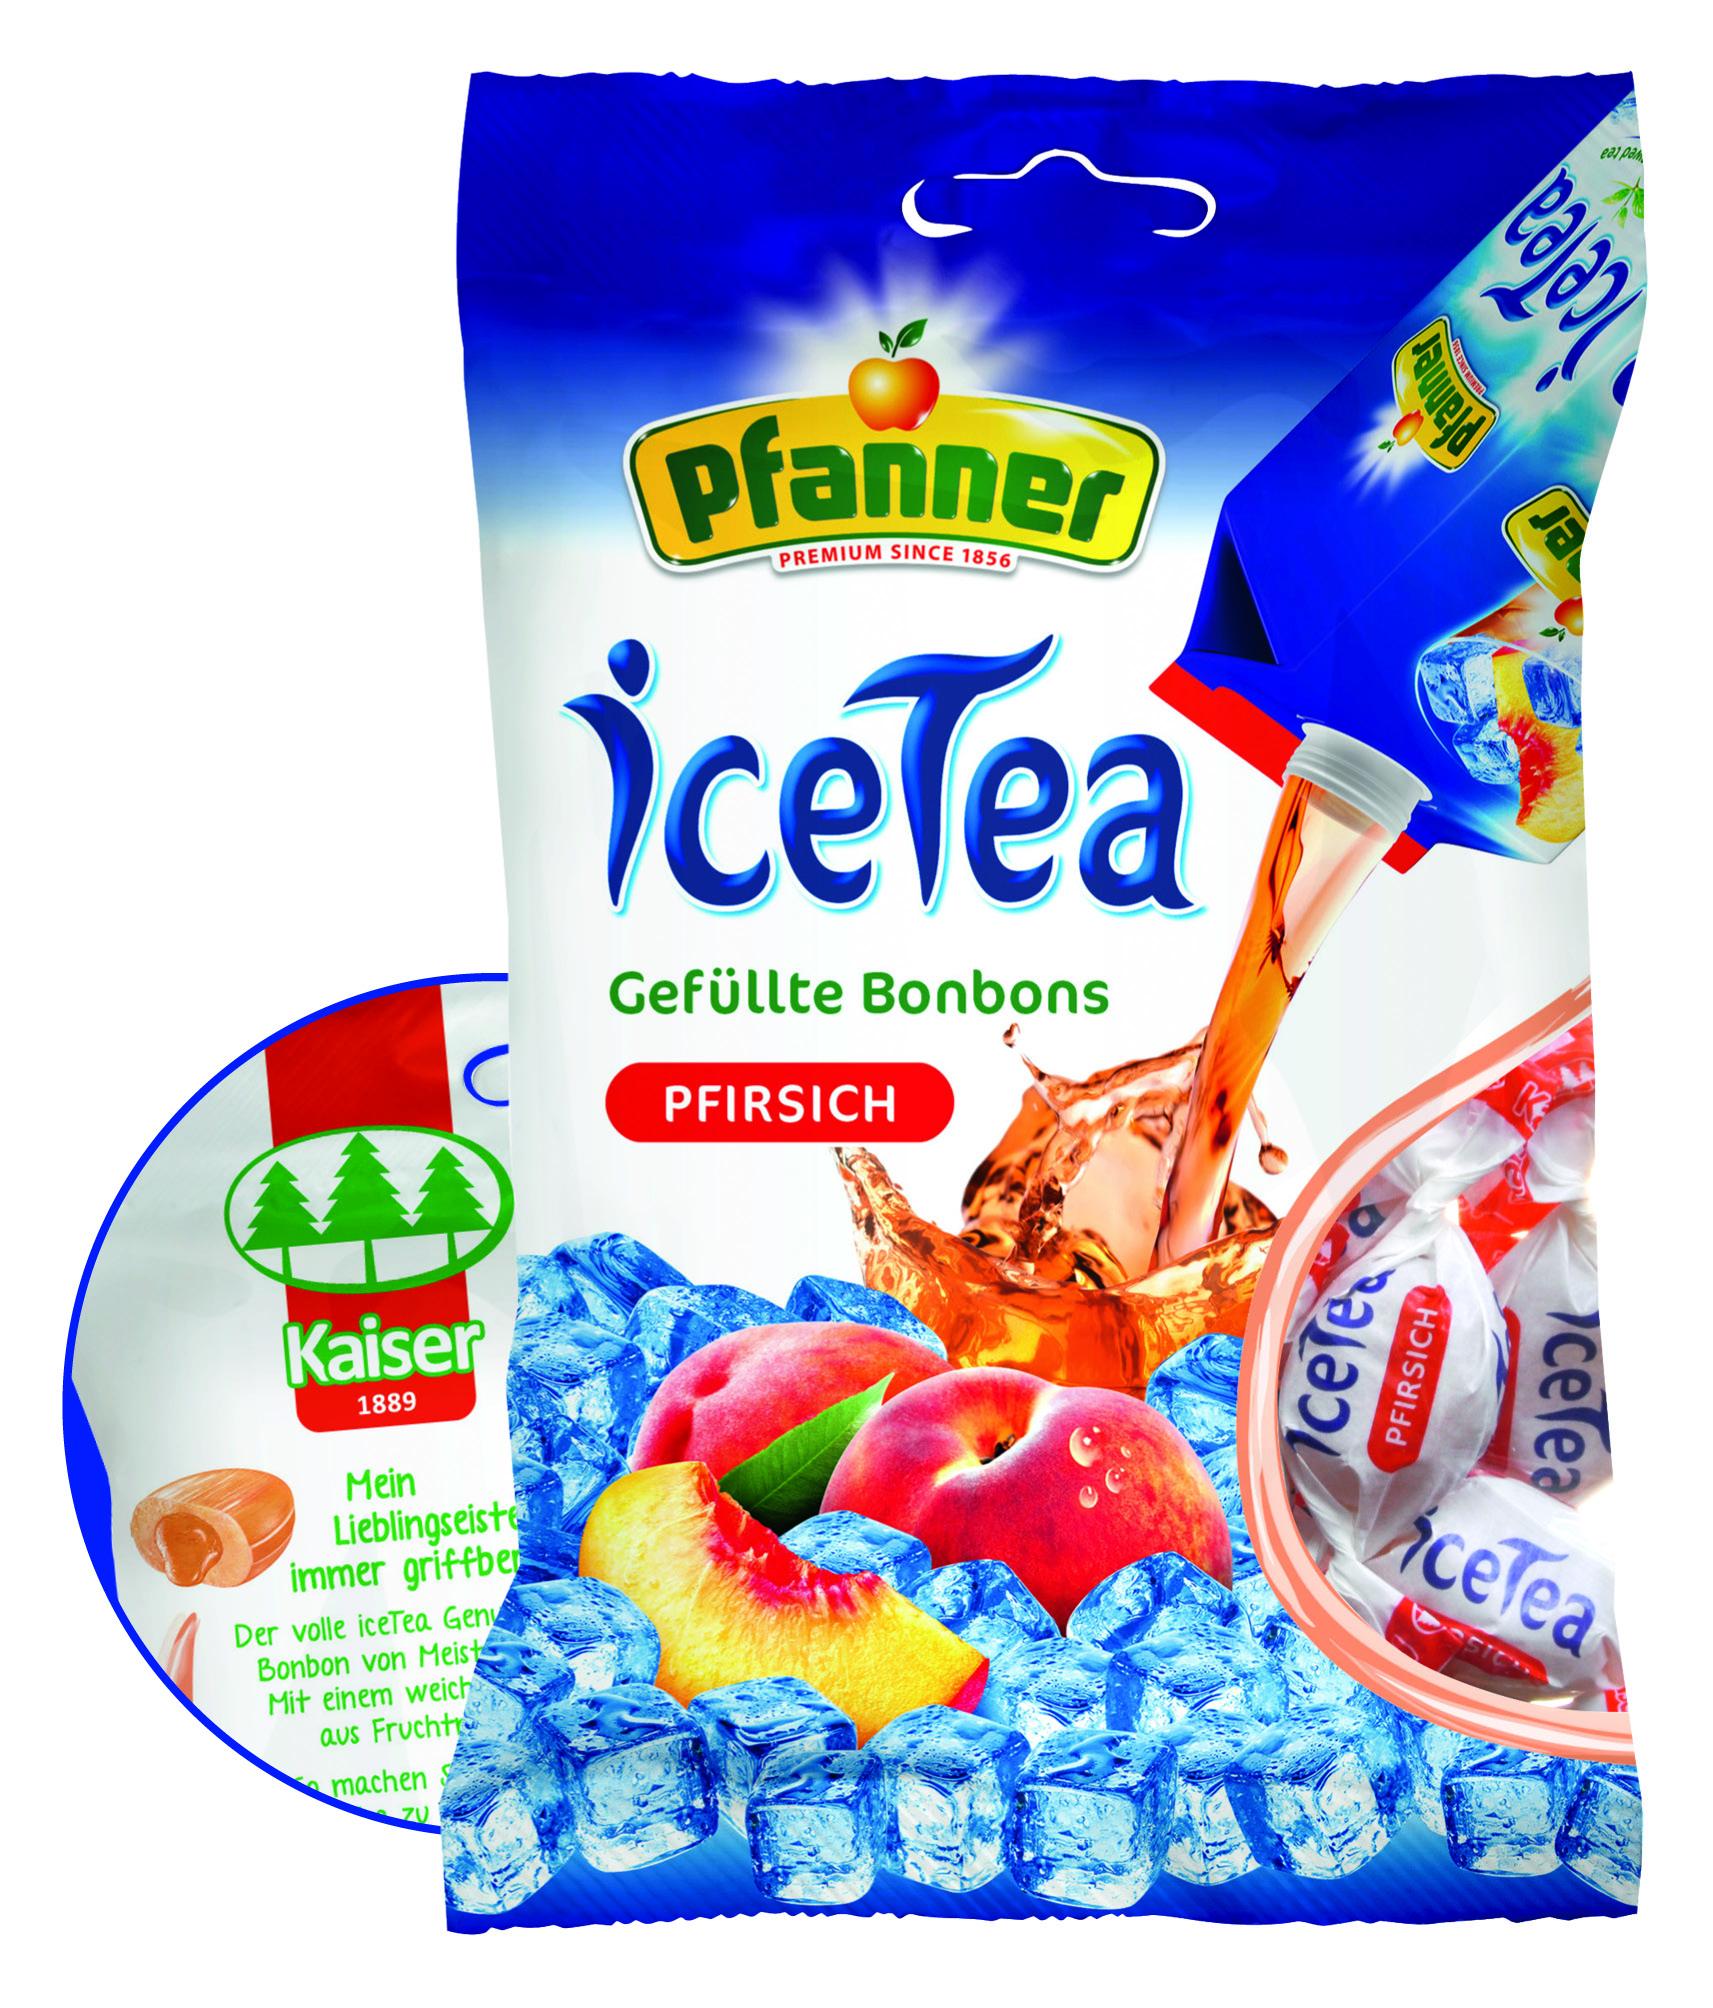 Kaiser iceTea Pfirsich